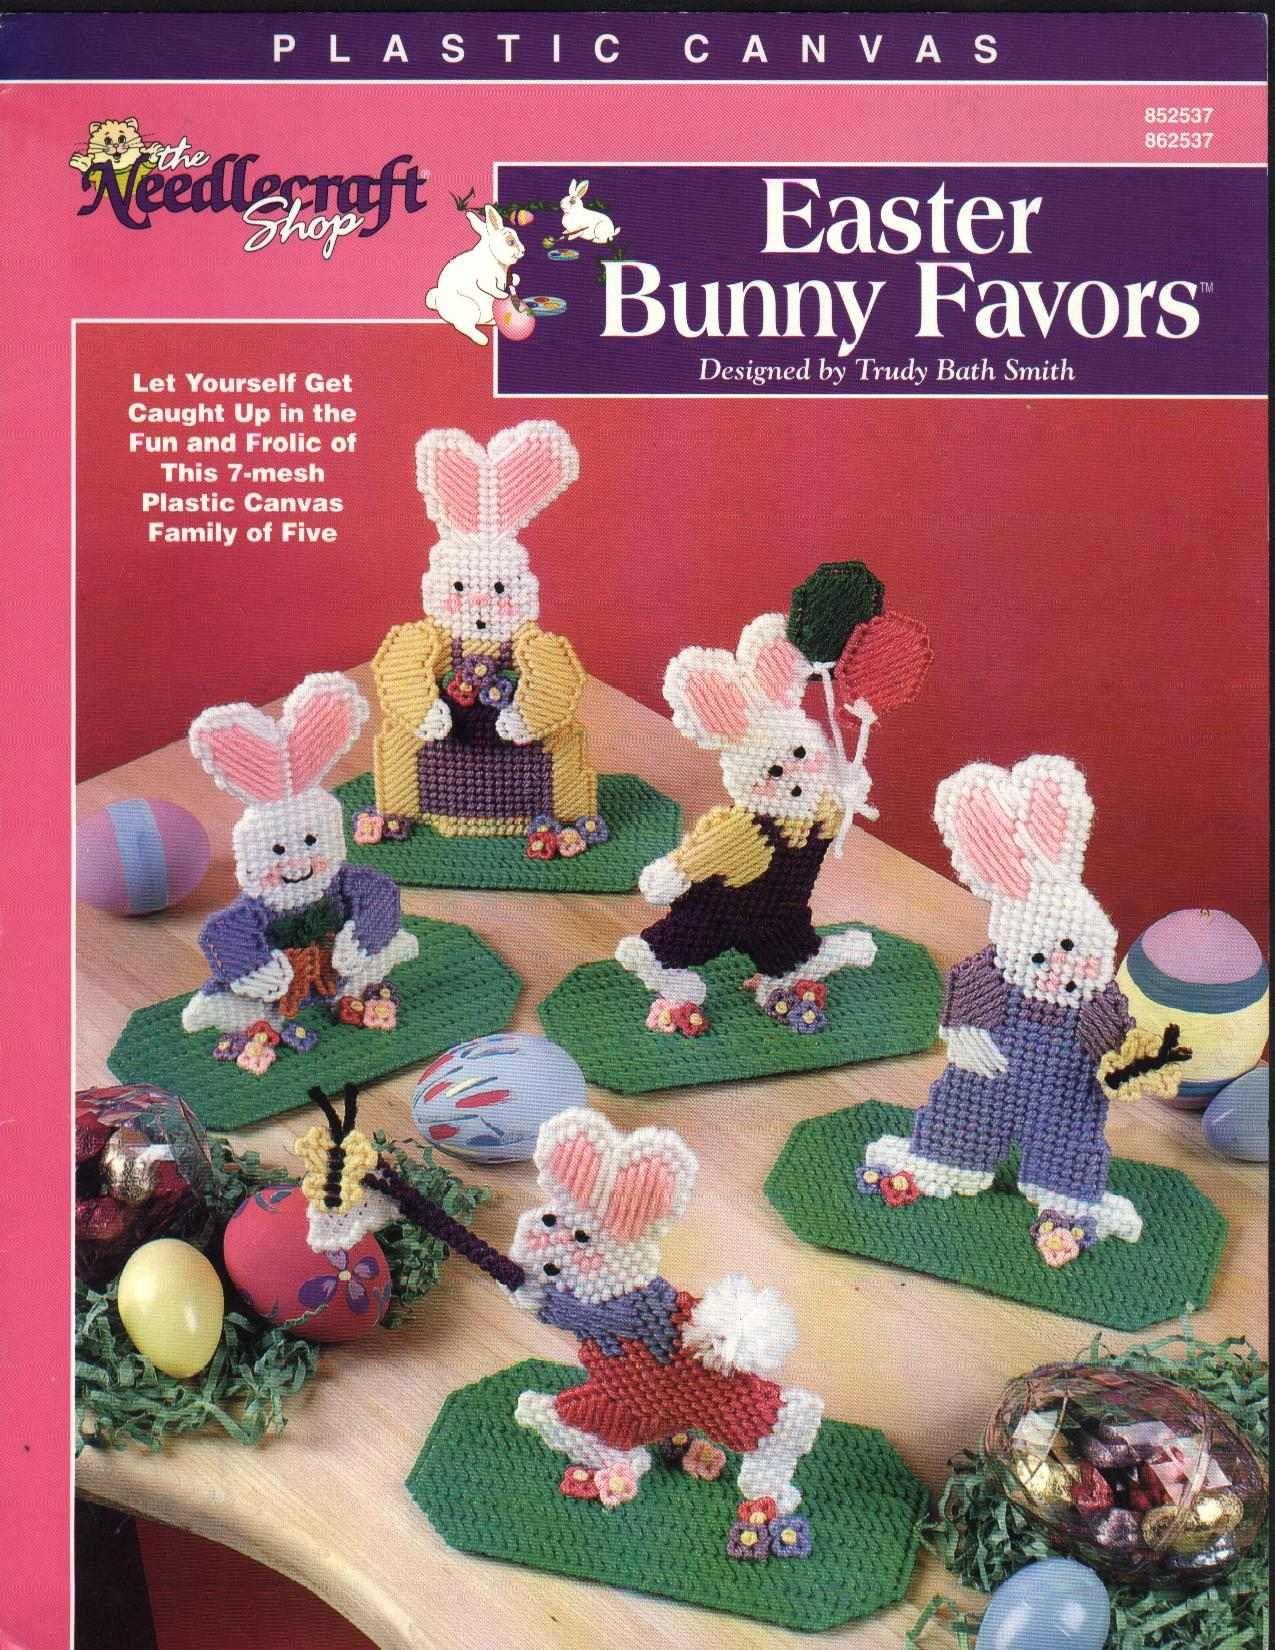 Easter bunny favors 1 lona de pl stico pinterest - Lonas de plastico ...